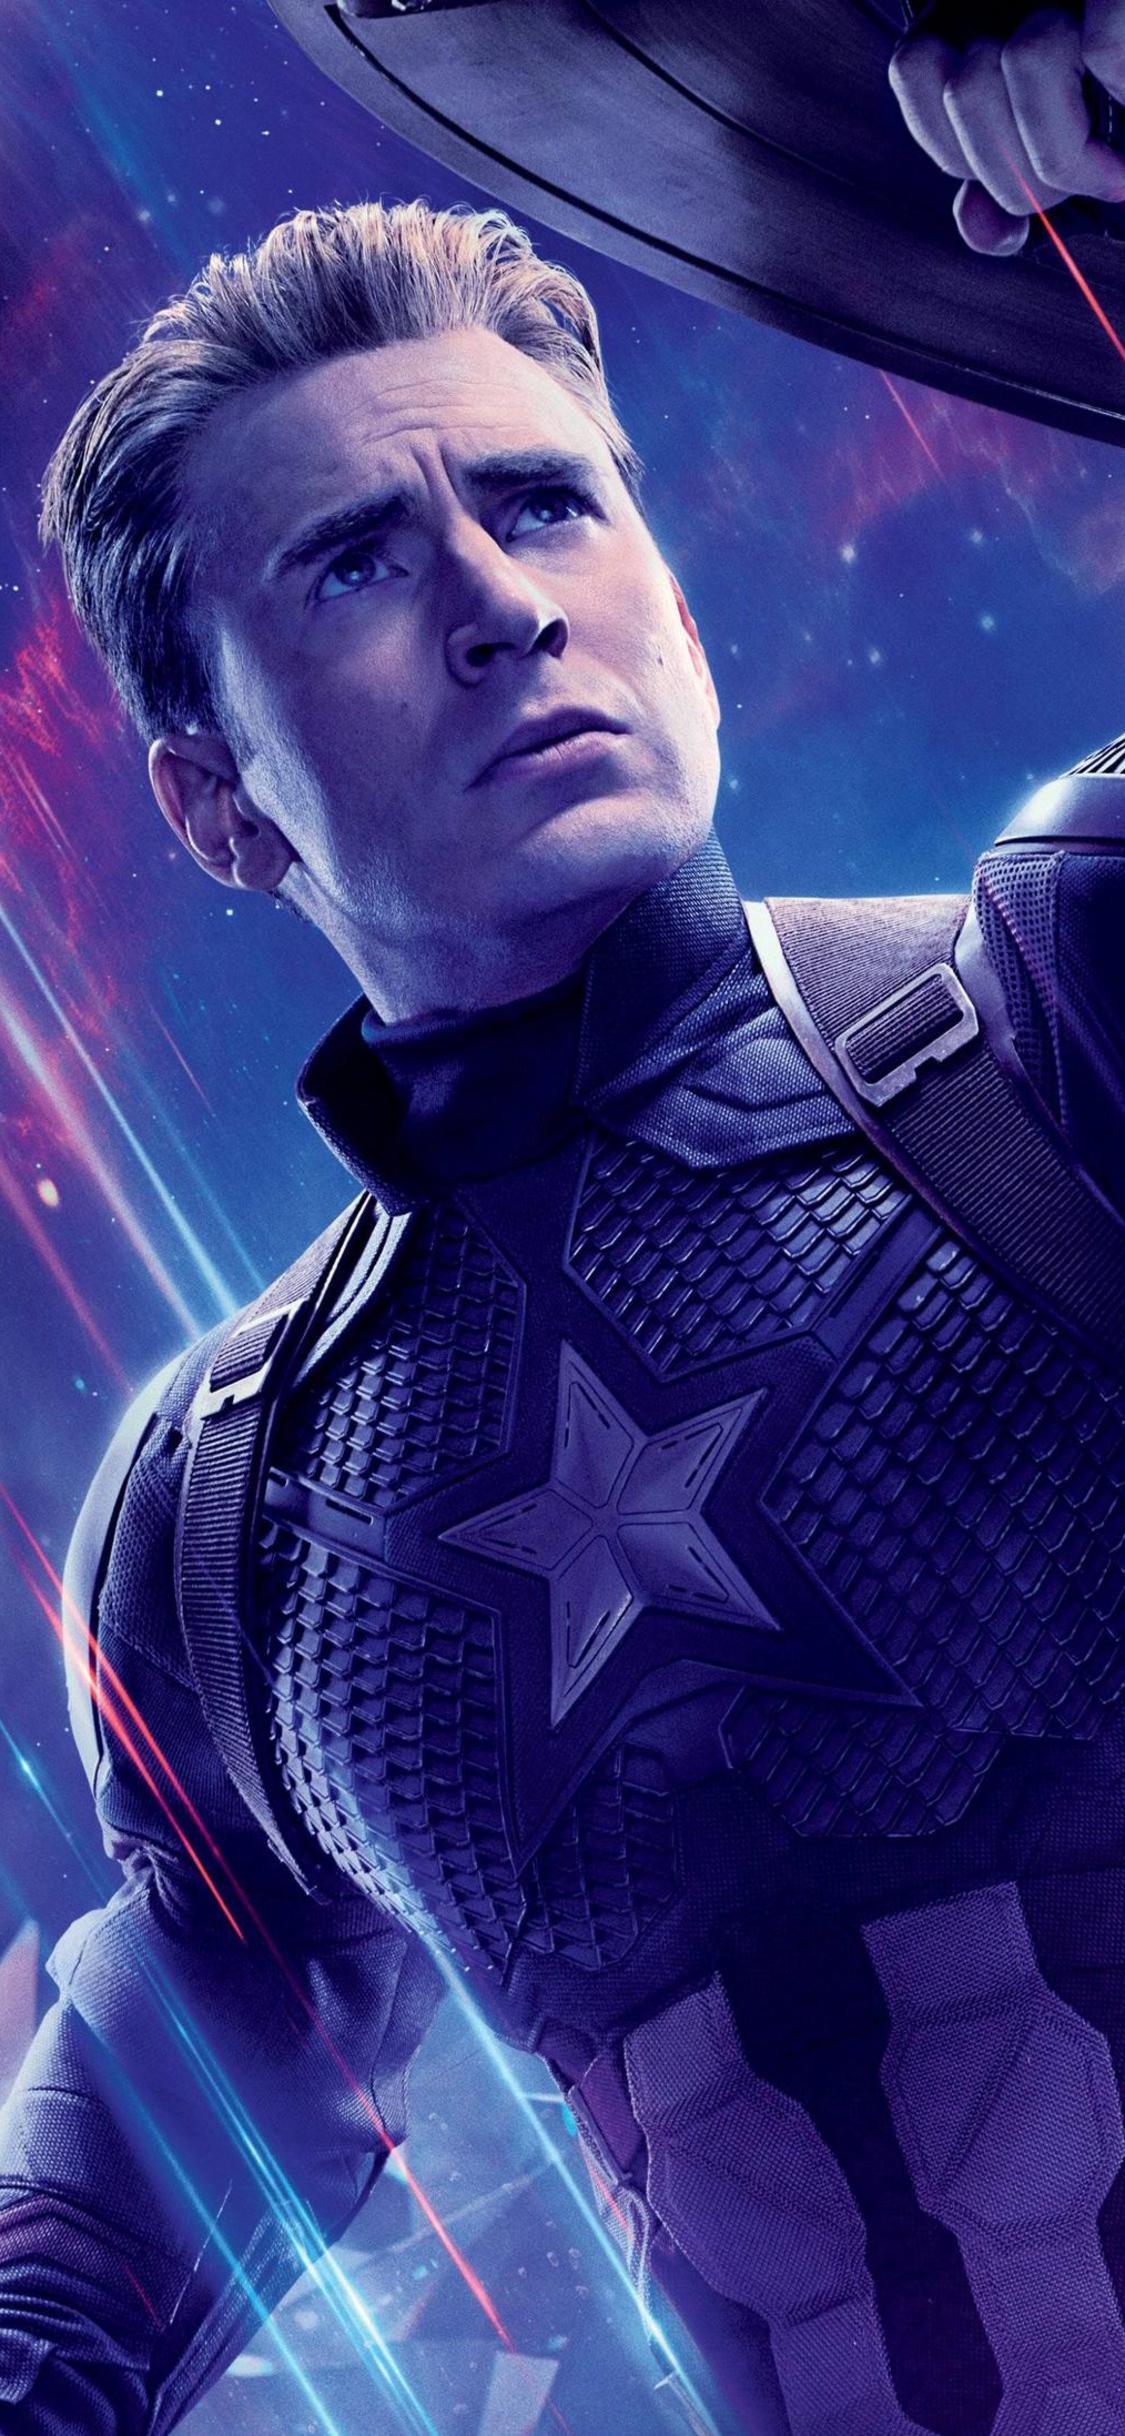 Captain America Avengers Endgame Phone Wallpapers Wallpaper Cave